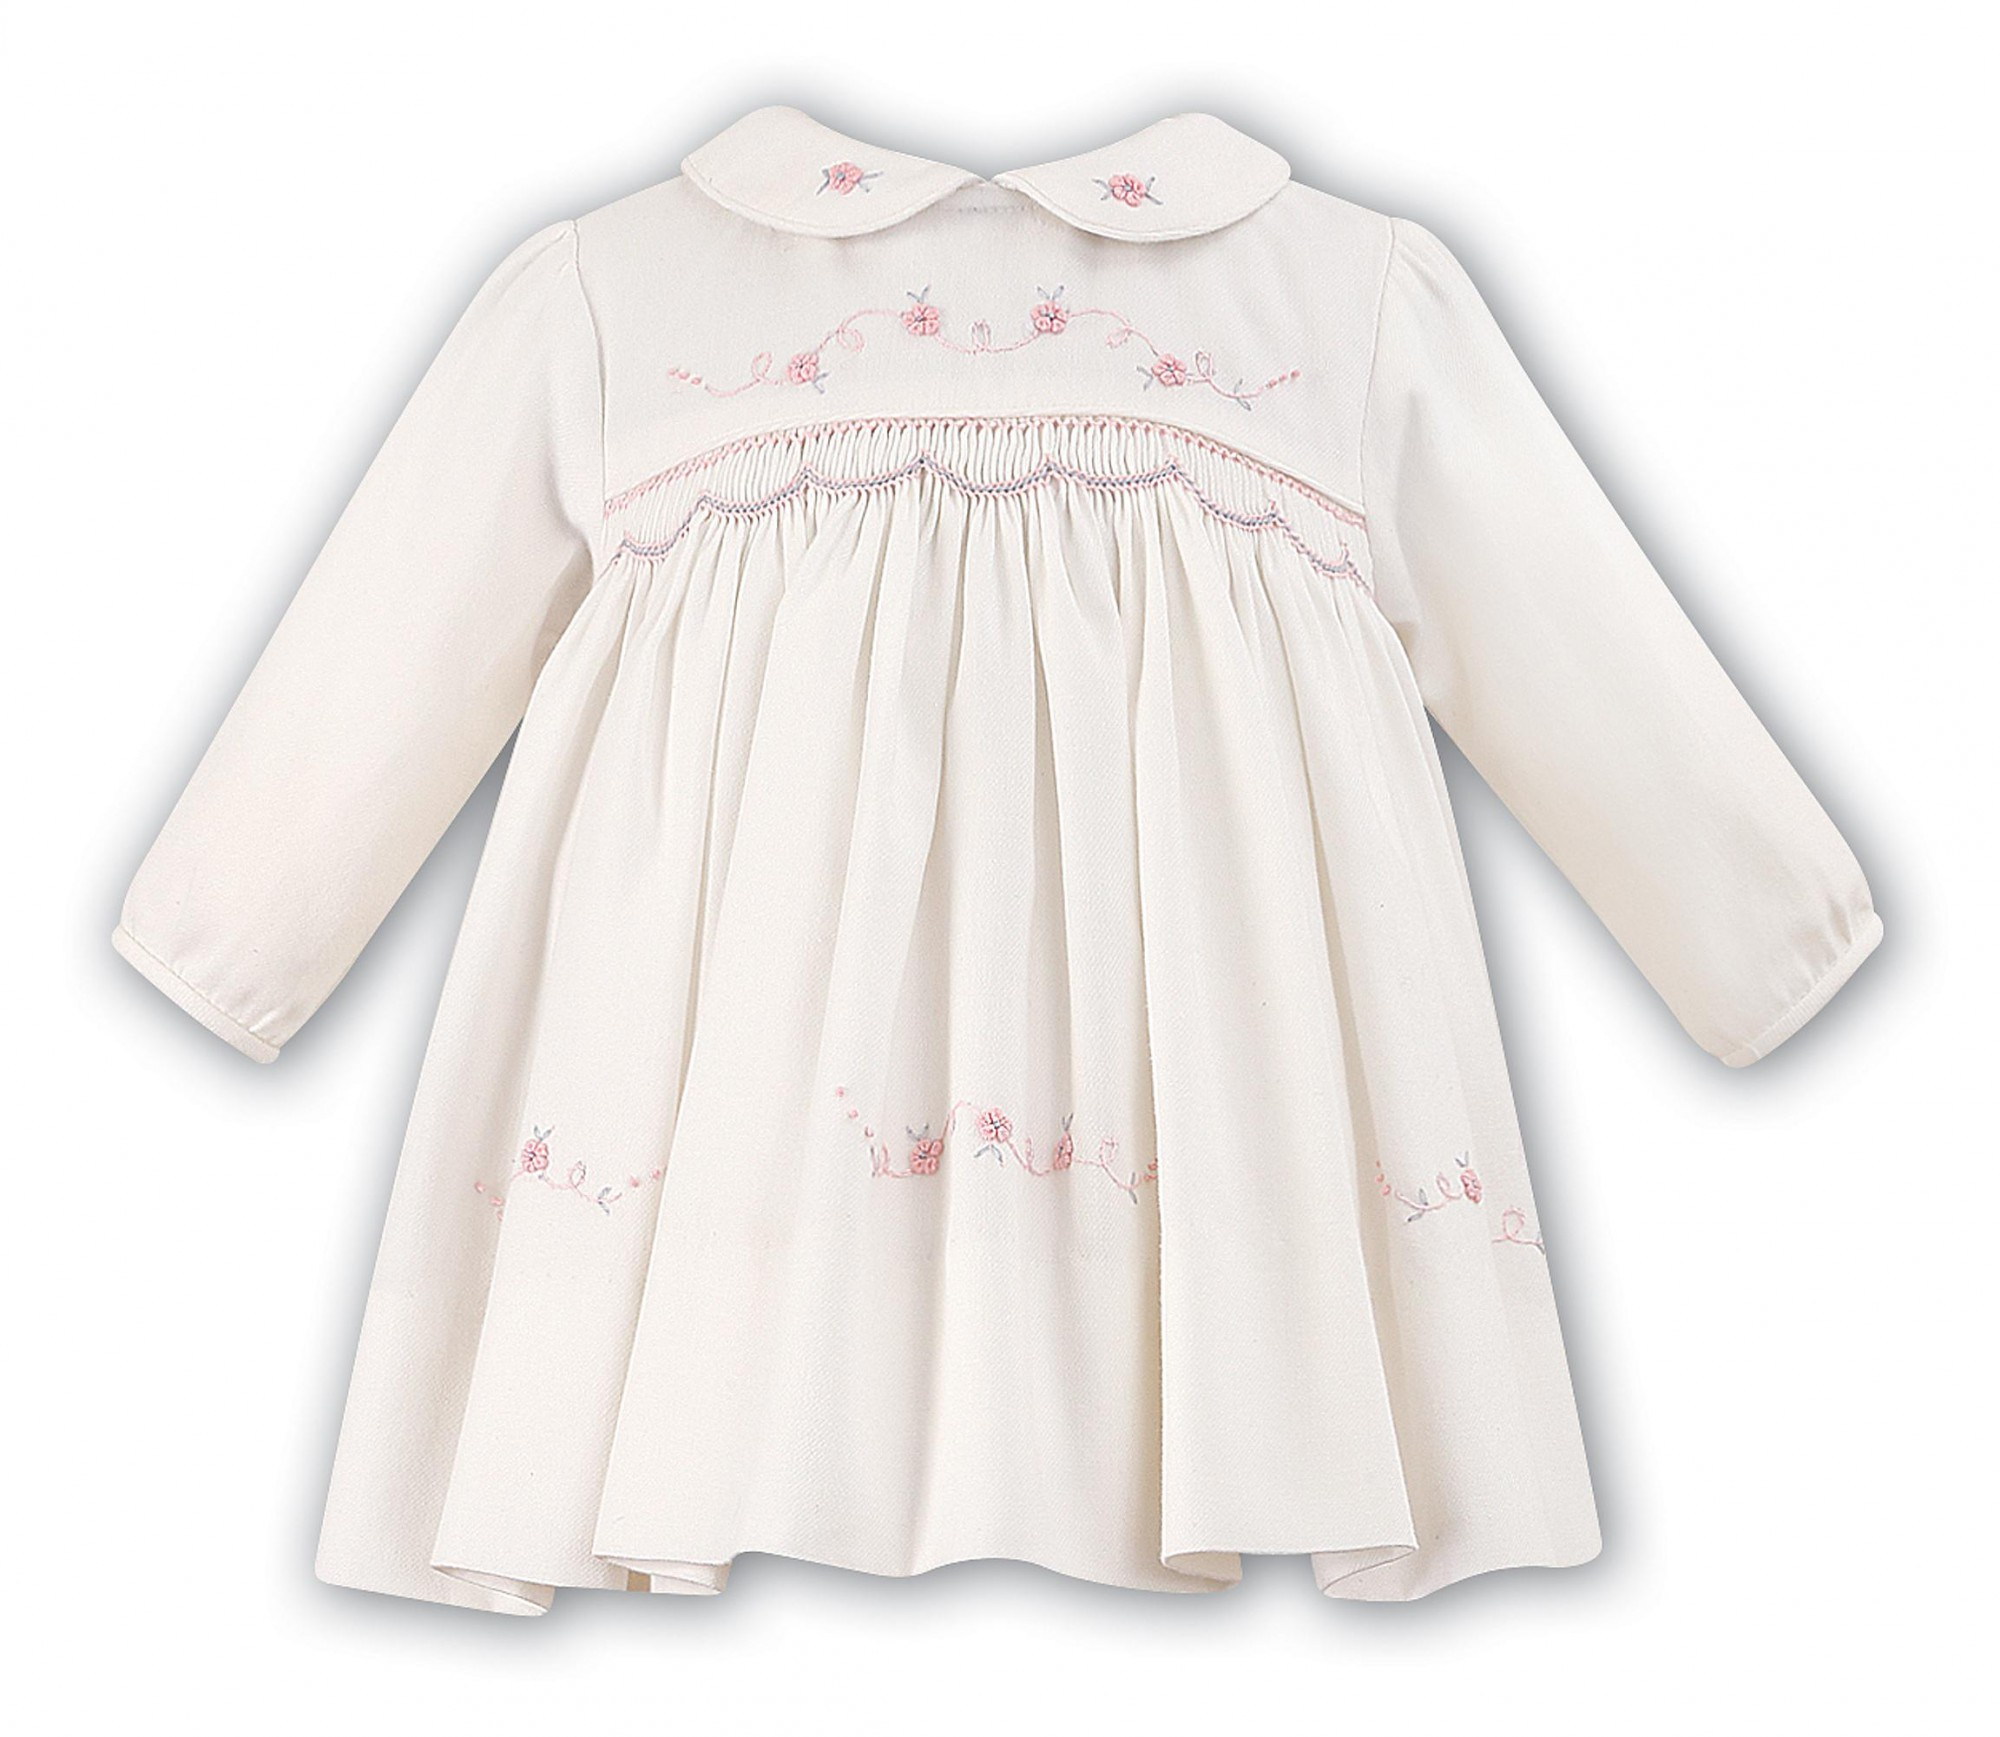 341ed35bd Sarah Louise 010477 Ivory/Pink Smocked Dress | | Olivers Childrens Wear